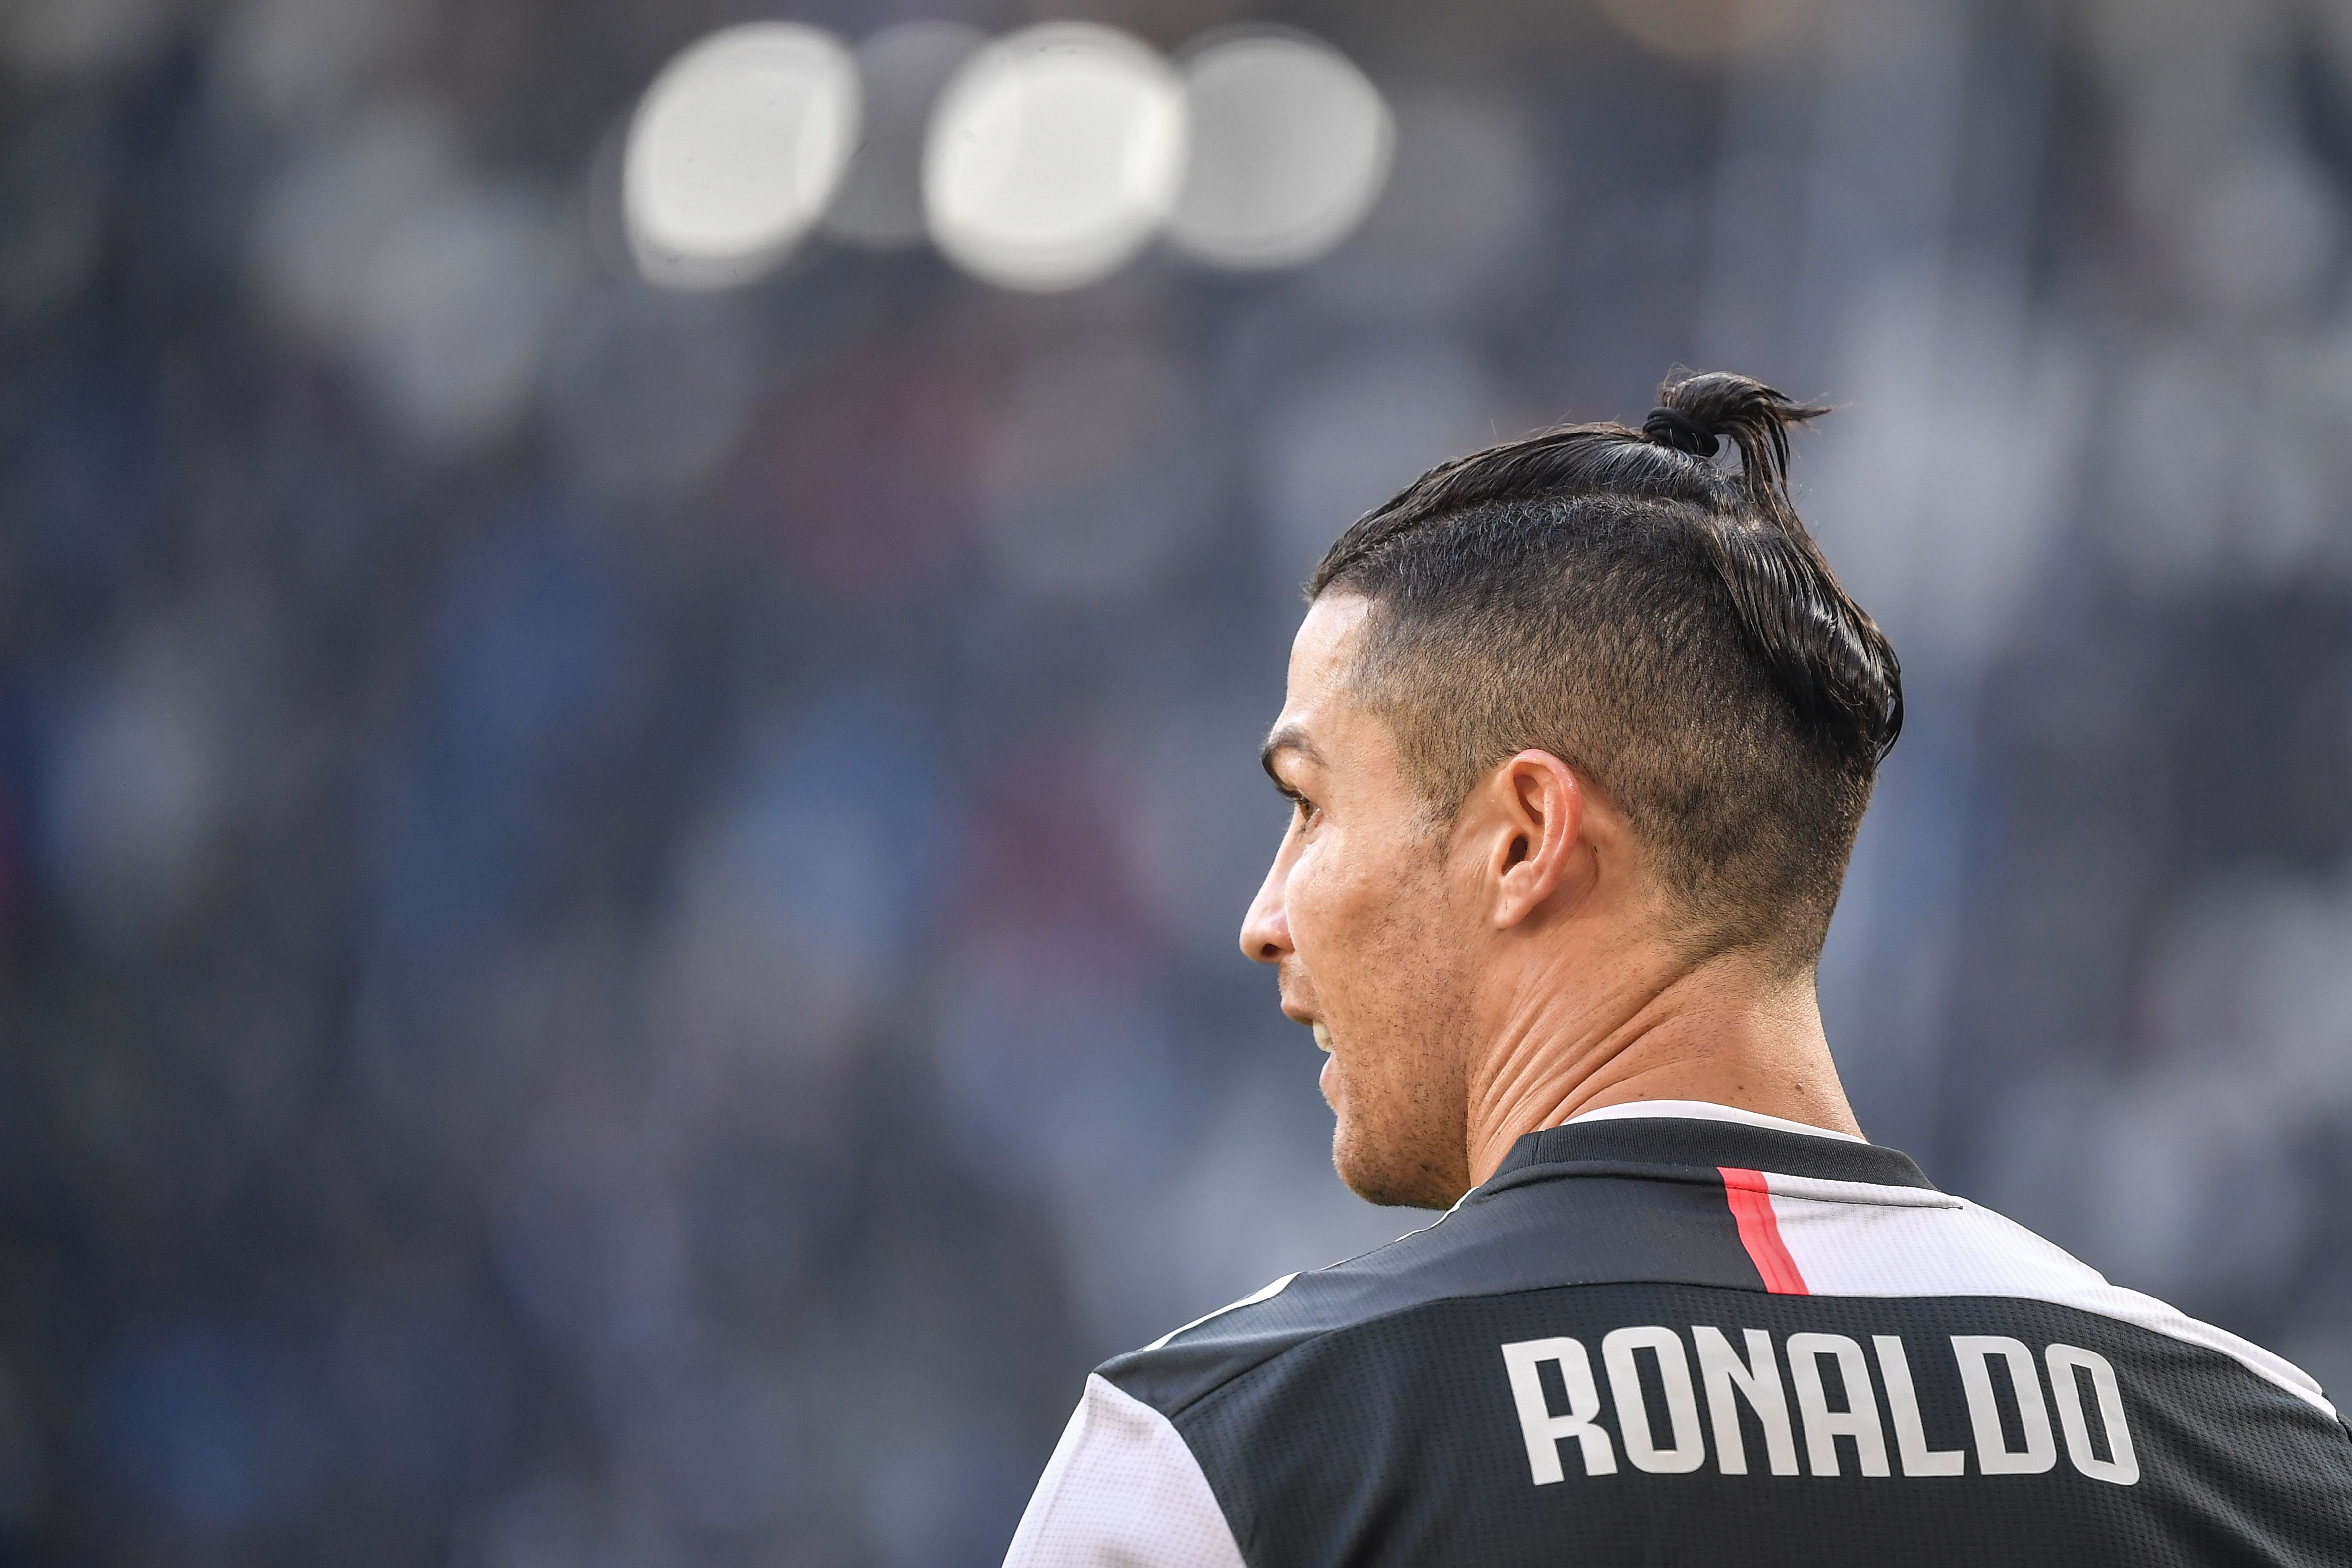 Ronaldo Continues Scoring Run With 2 Penalties As Juve Stay Top Deccan Herald